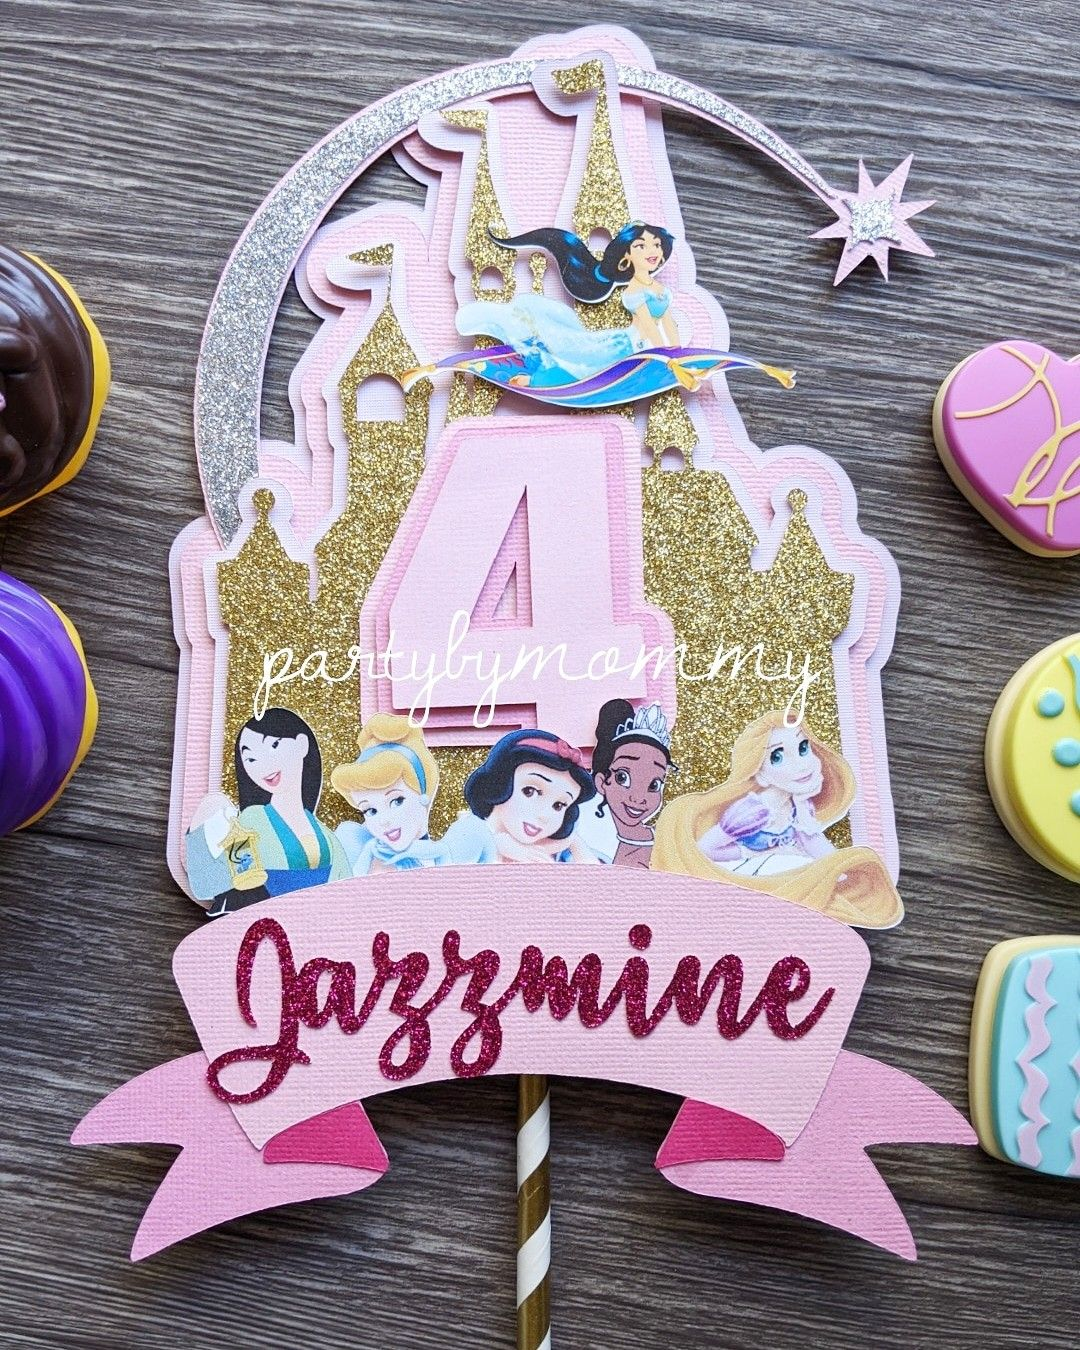 Disney princesses and princes inspired theme cake topper